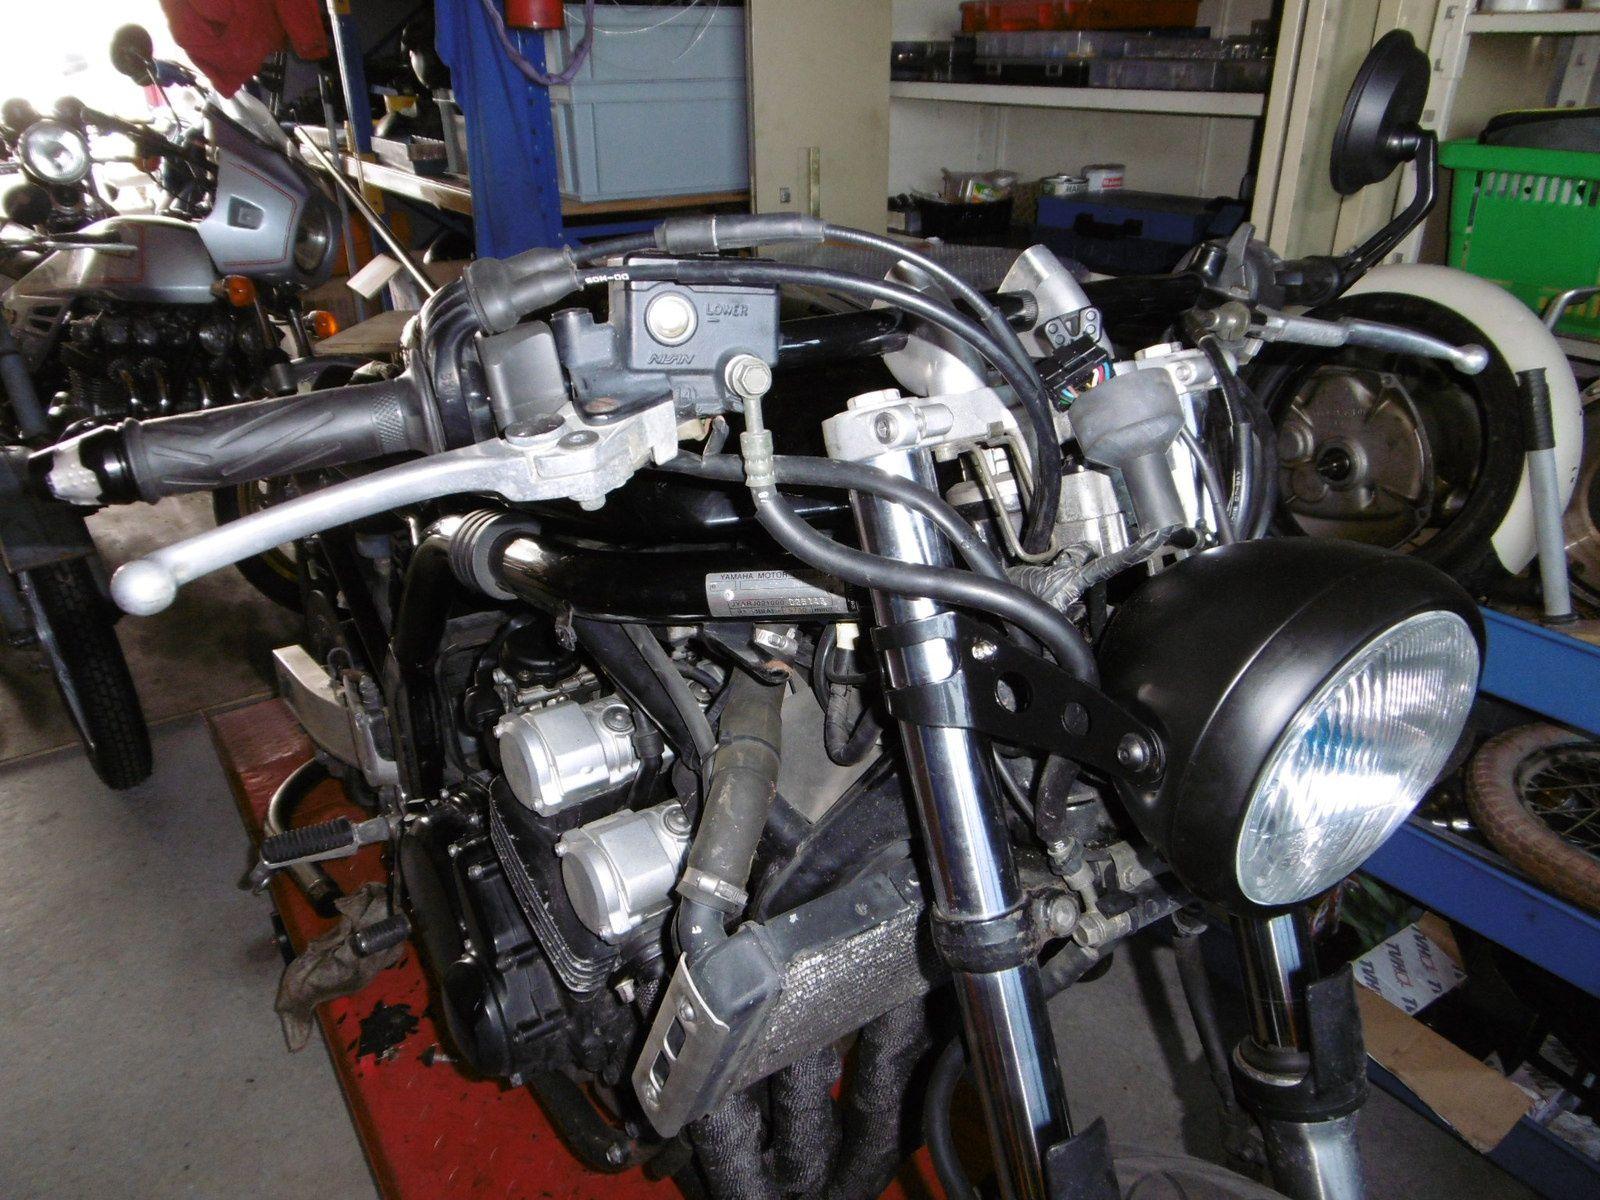 Yamaha Fazer 600 modifié avec Antoine ;)